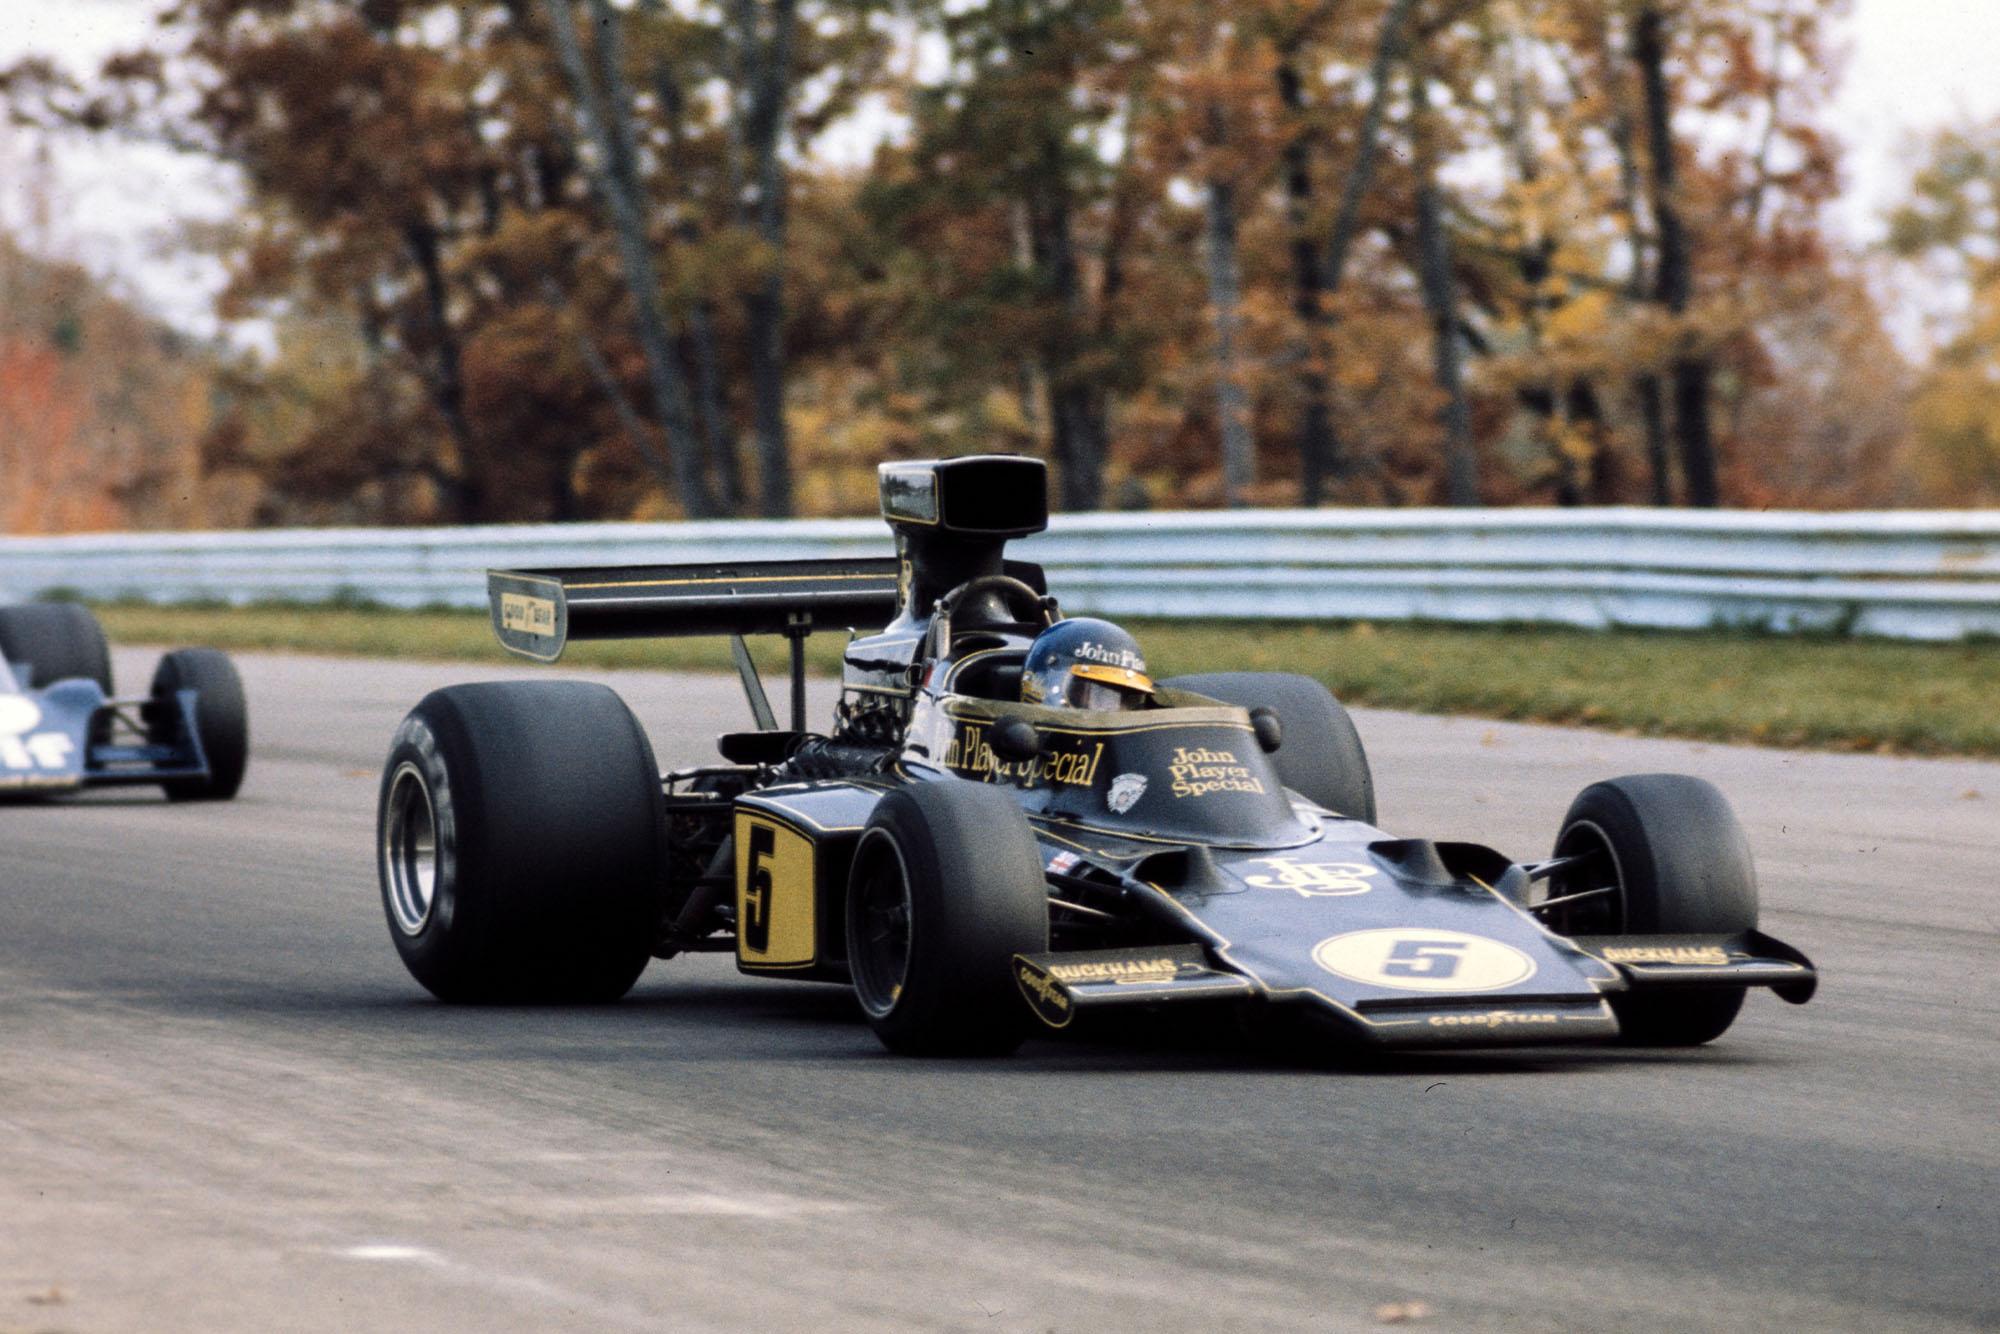 Ronnie Peterson (Lotus) at the 1975 United States Grad Prix, Watkins Glen